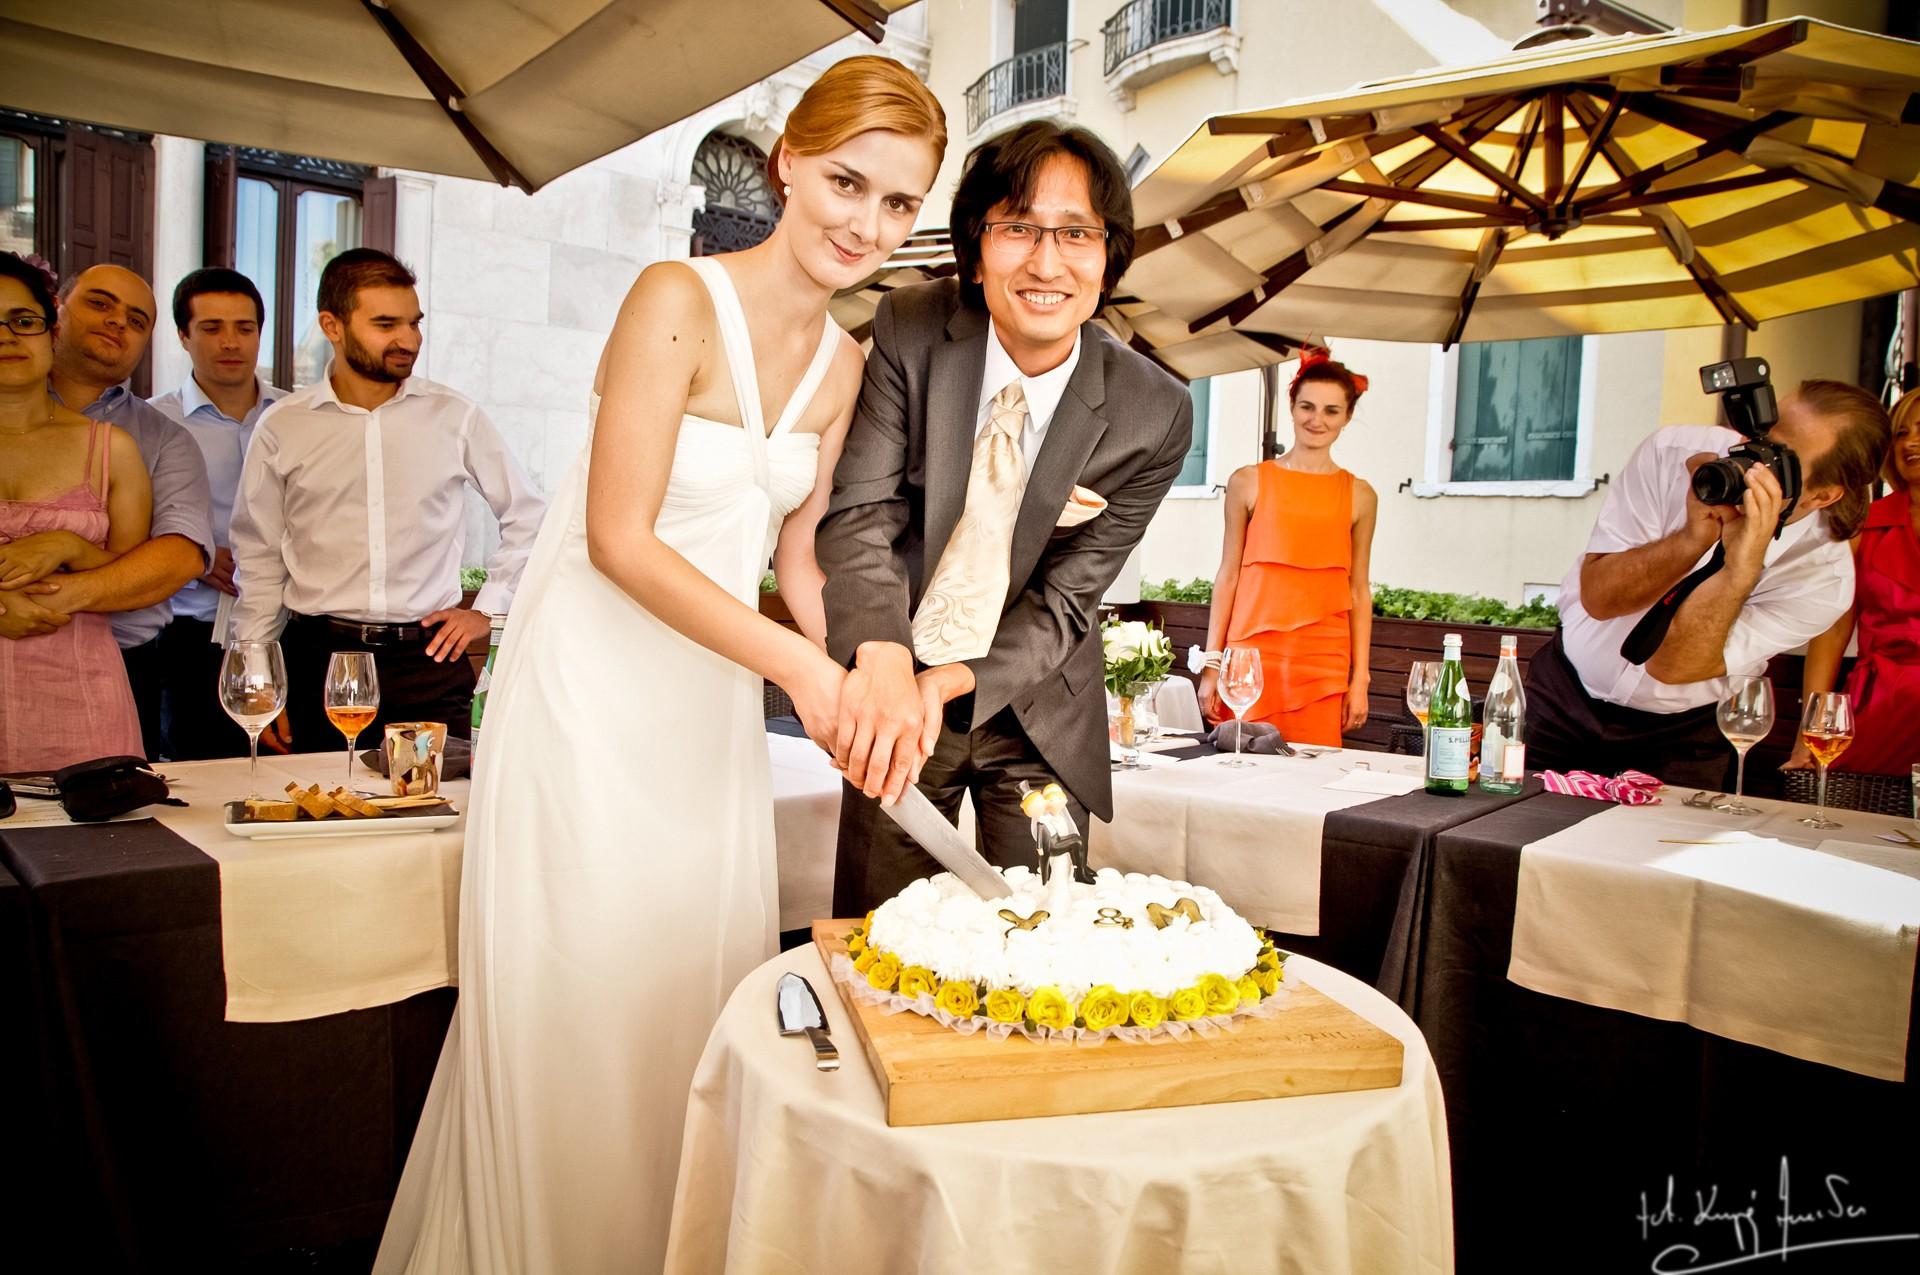 Ślub w wenecji 69 Manuela Luiza & Young Seon Song